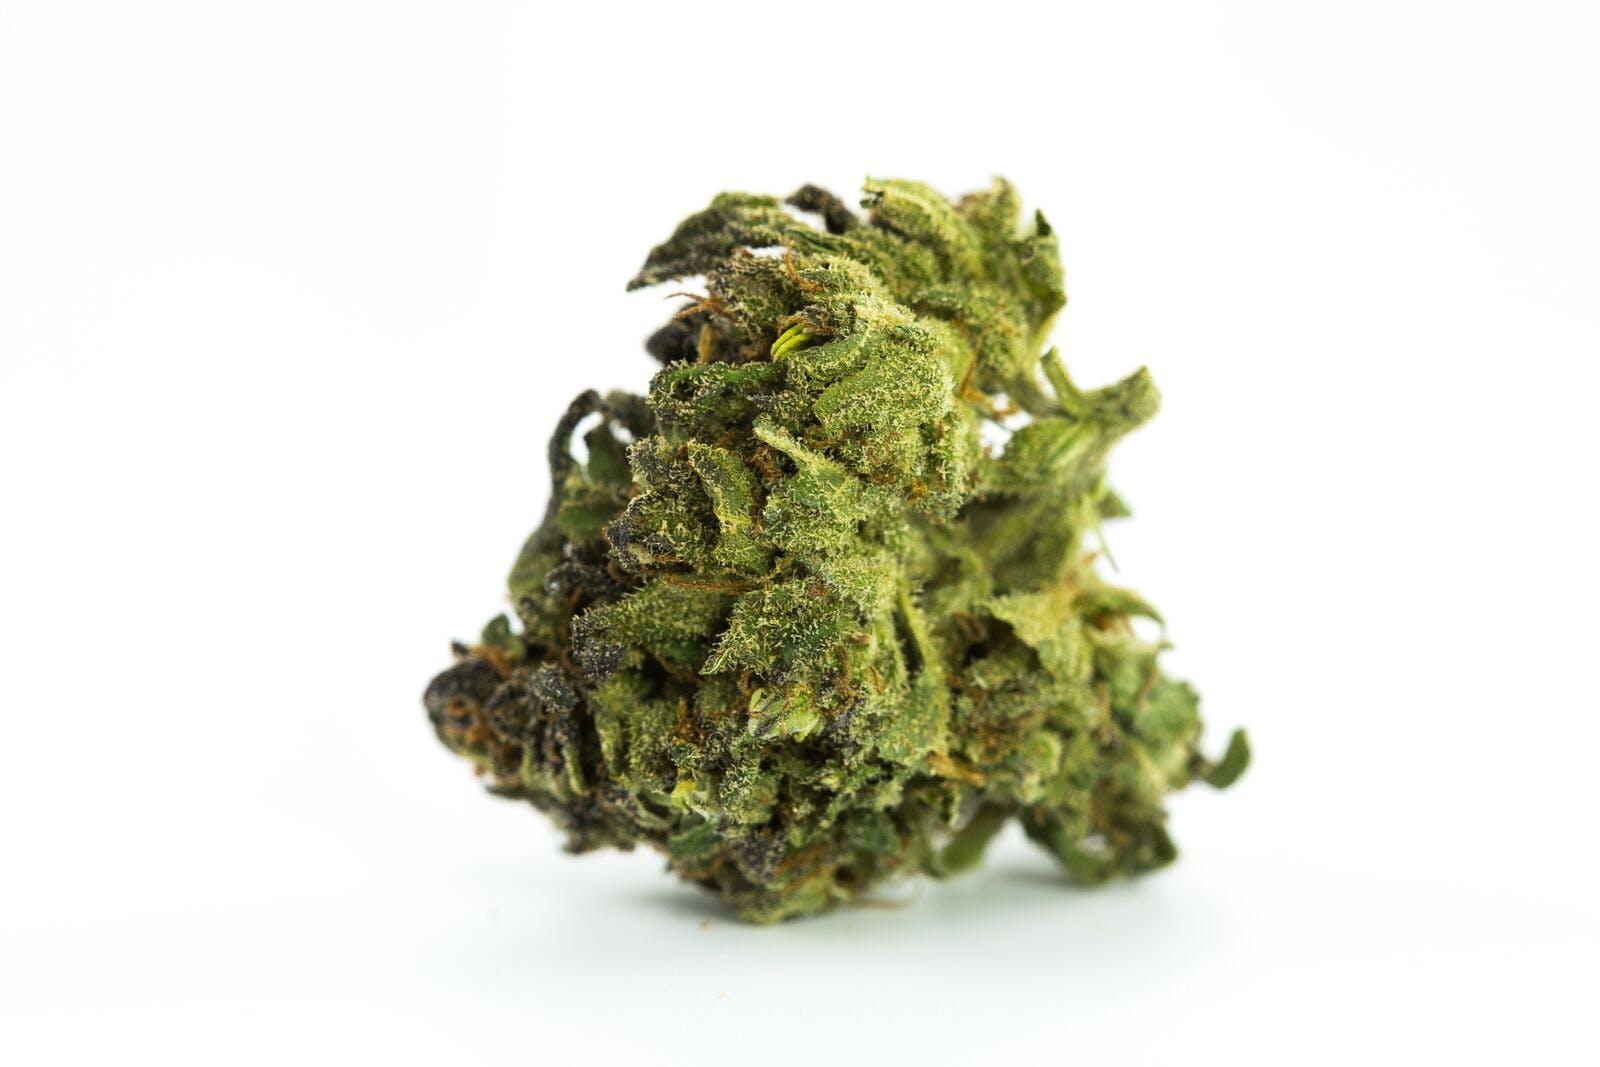 Green Dragon Weed; Green Dragon Cannabis Strain; Green Dragon Indica Marijuana Strain